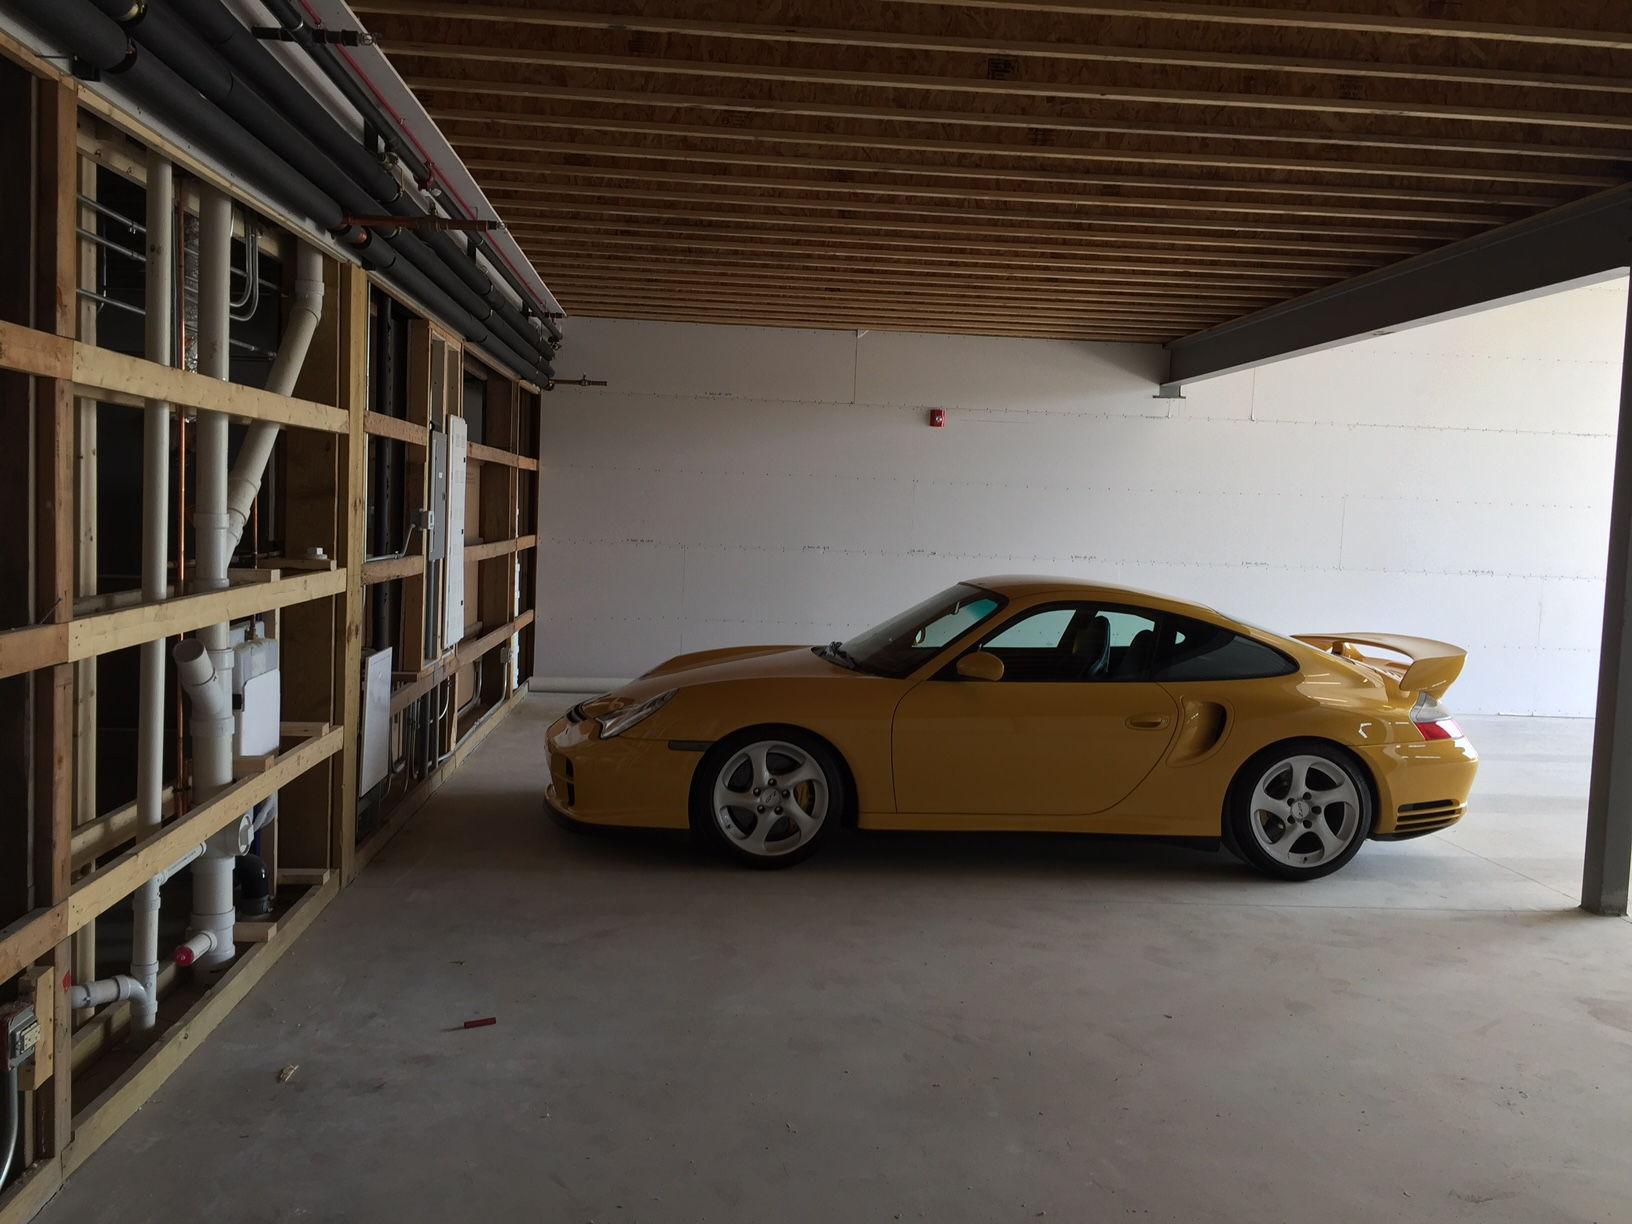 2016 zo6 corvette build 2017 2018 best cars reviews. Black Bedroom Furniture Sets. Home Design Ideas